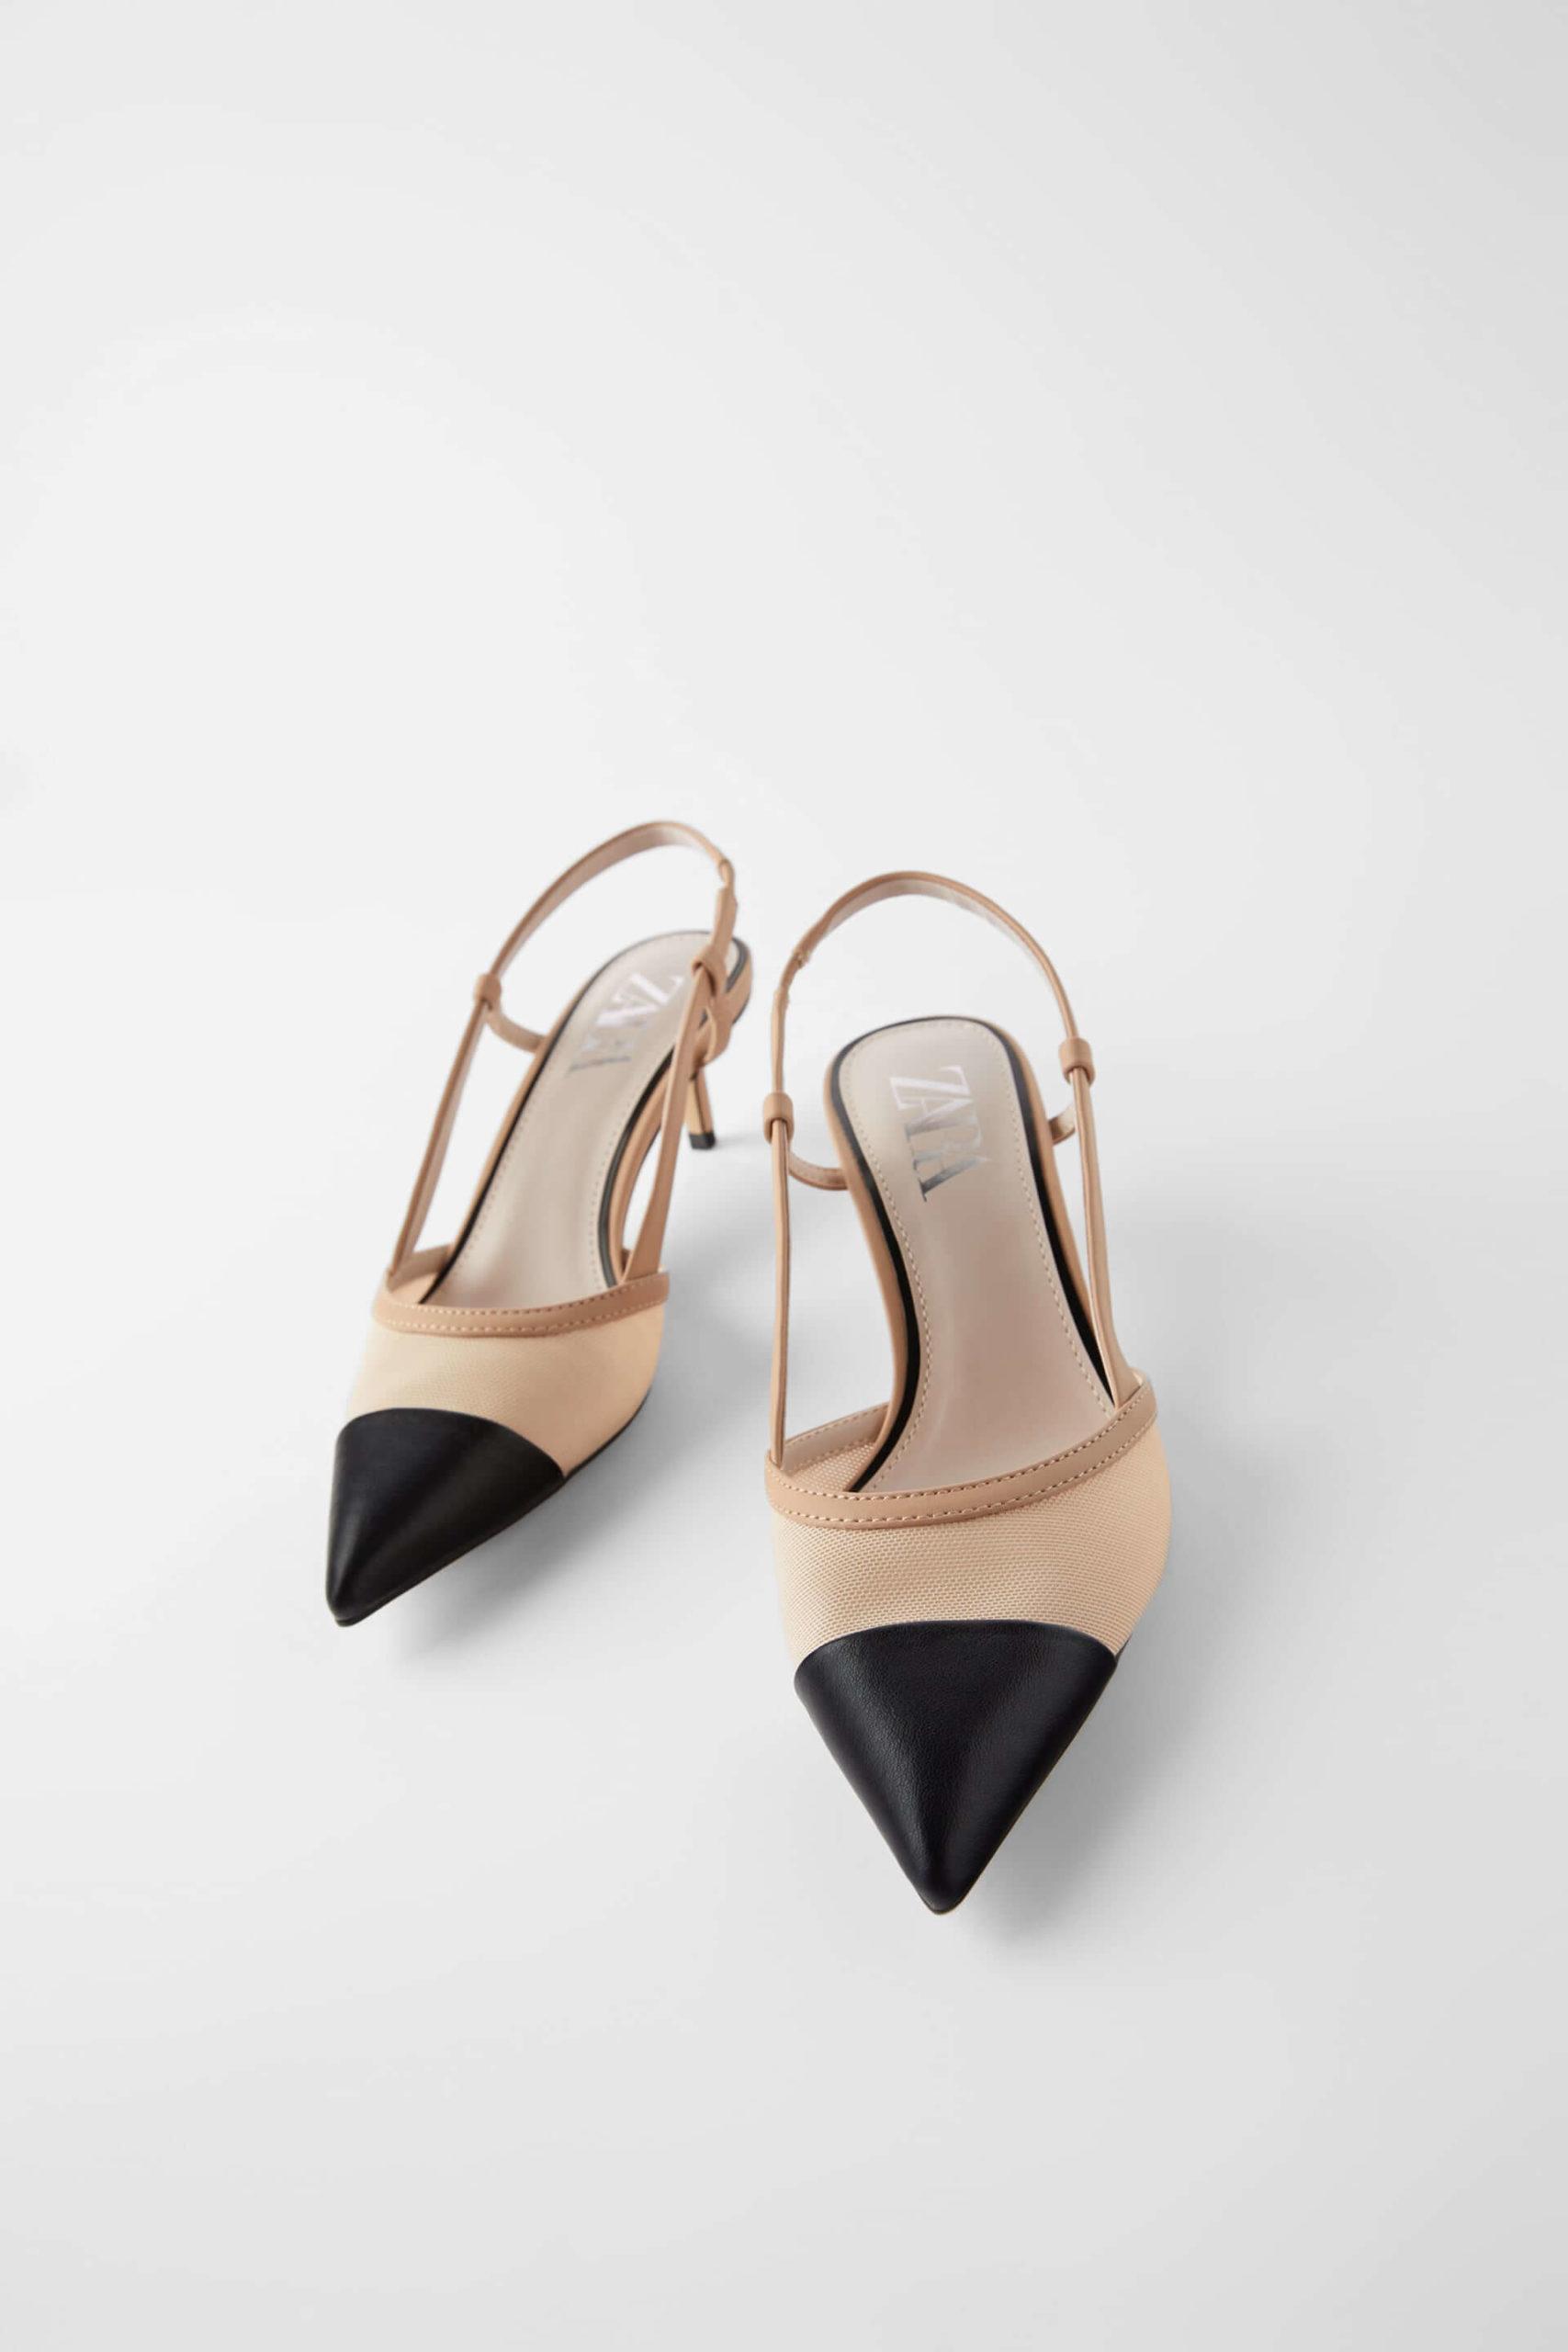 zara kısa topuklu ayakkabı